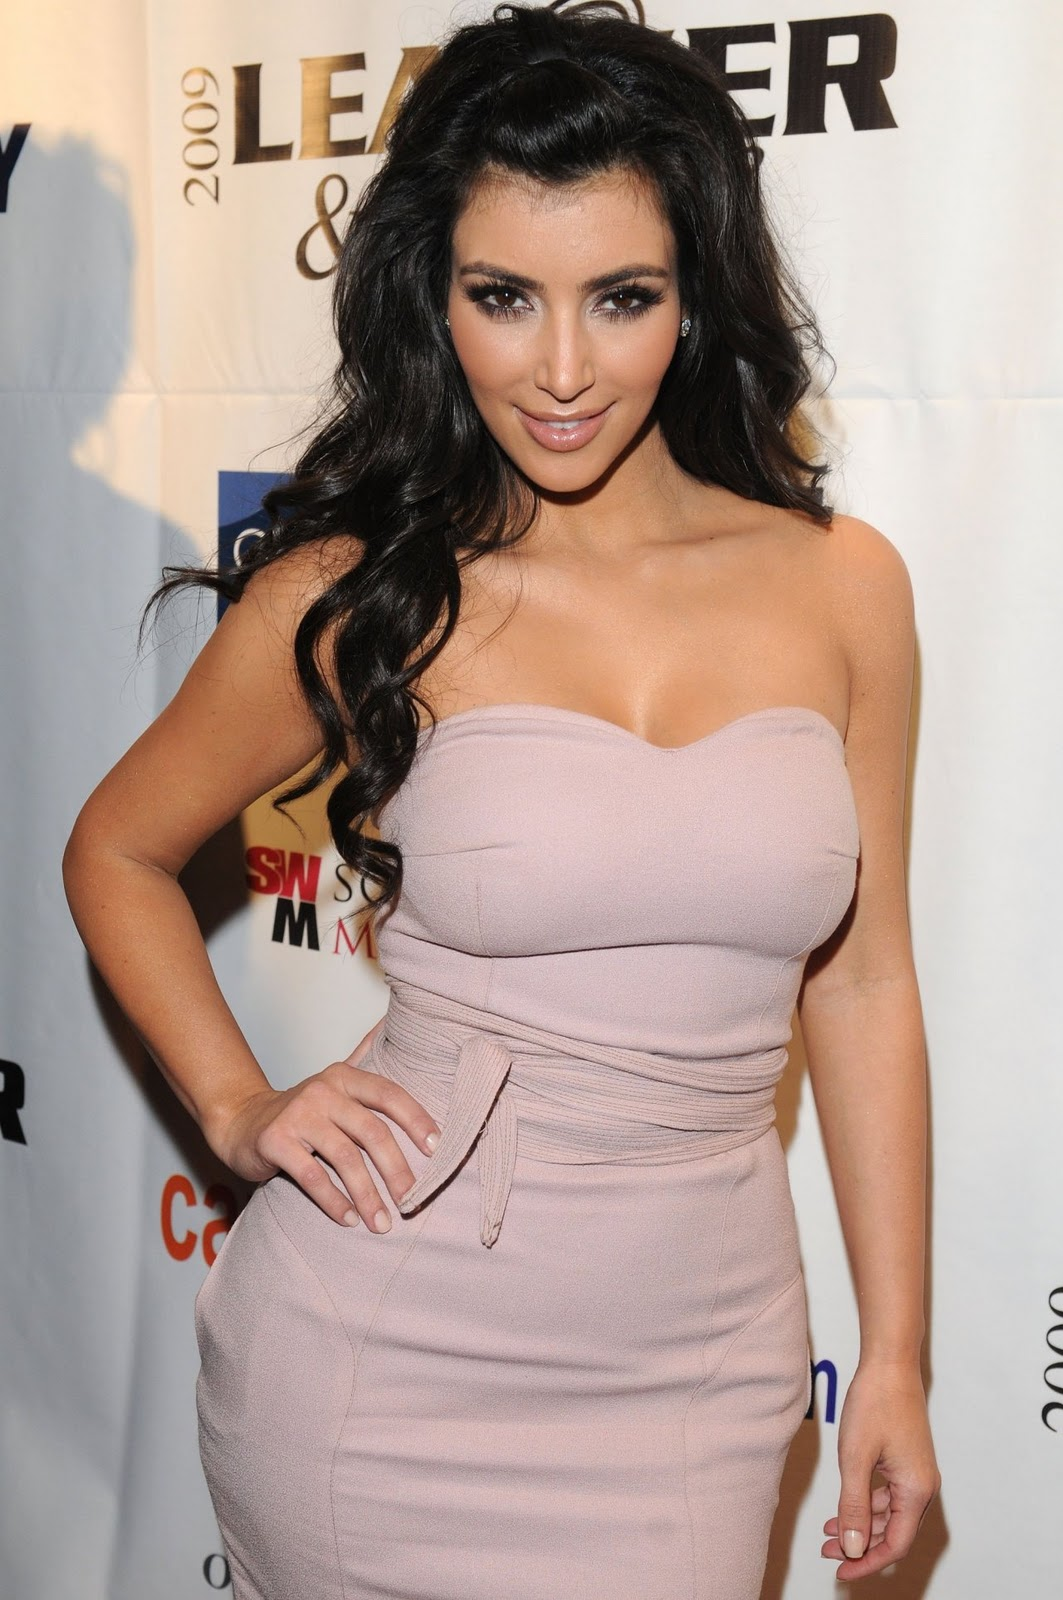 http://4.bp.blogspot.com/-RrGzFAhbtx8/Tw5jxAxDzhI/AAAAAAAABGw/tploZNwtsls/s1600/Kim+Kardashian+3.jpg